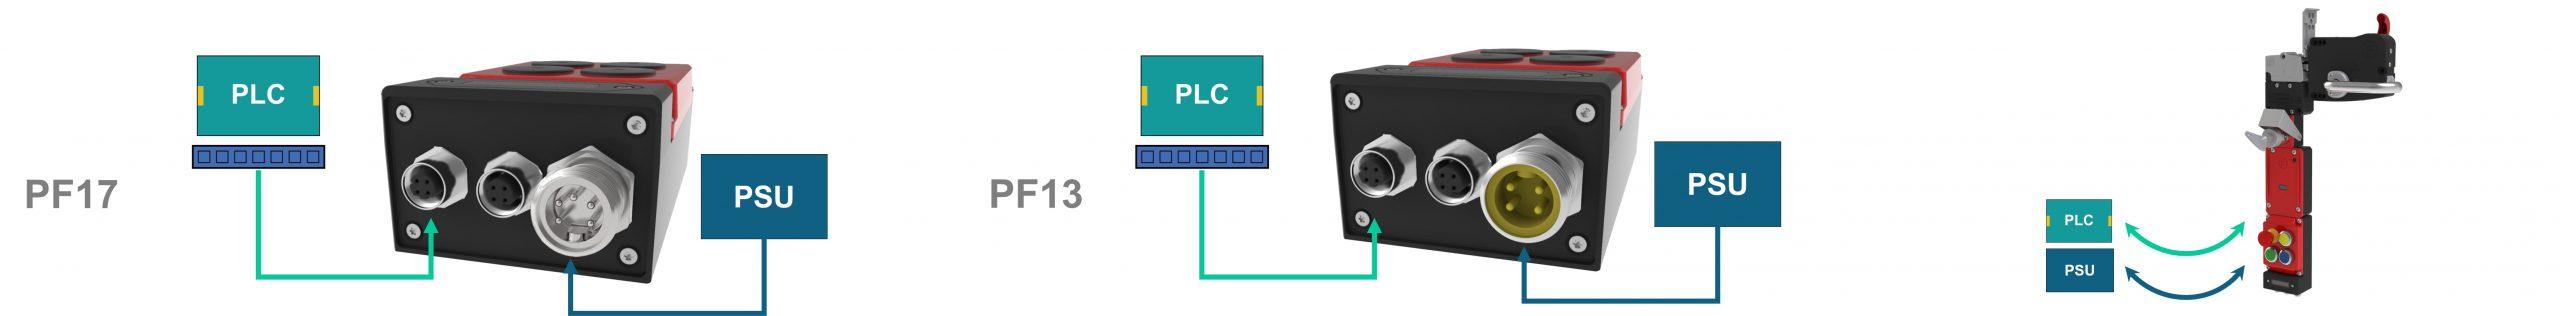 PF17 PF13 Networked Interlocks Connector Sets